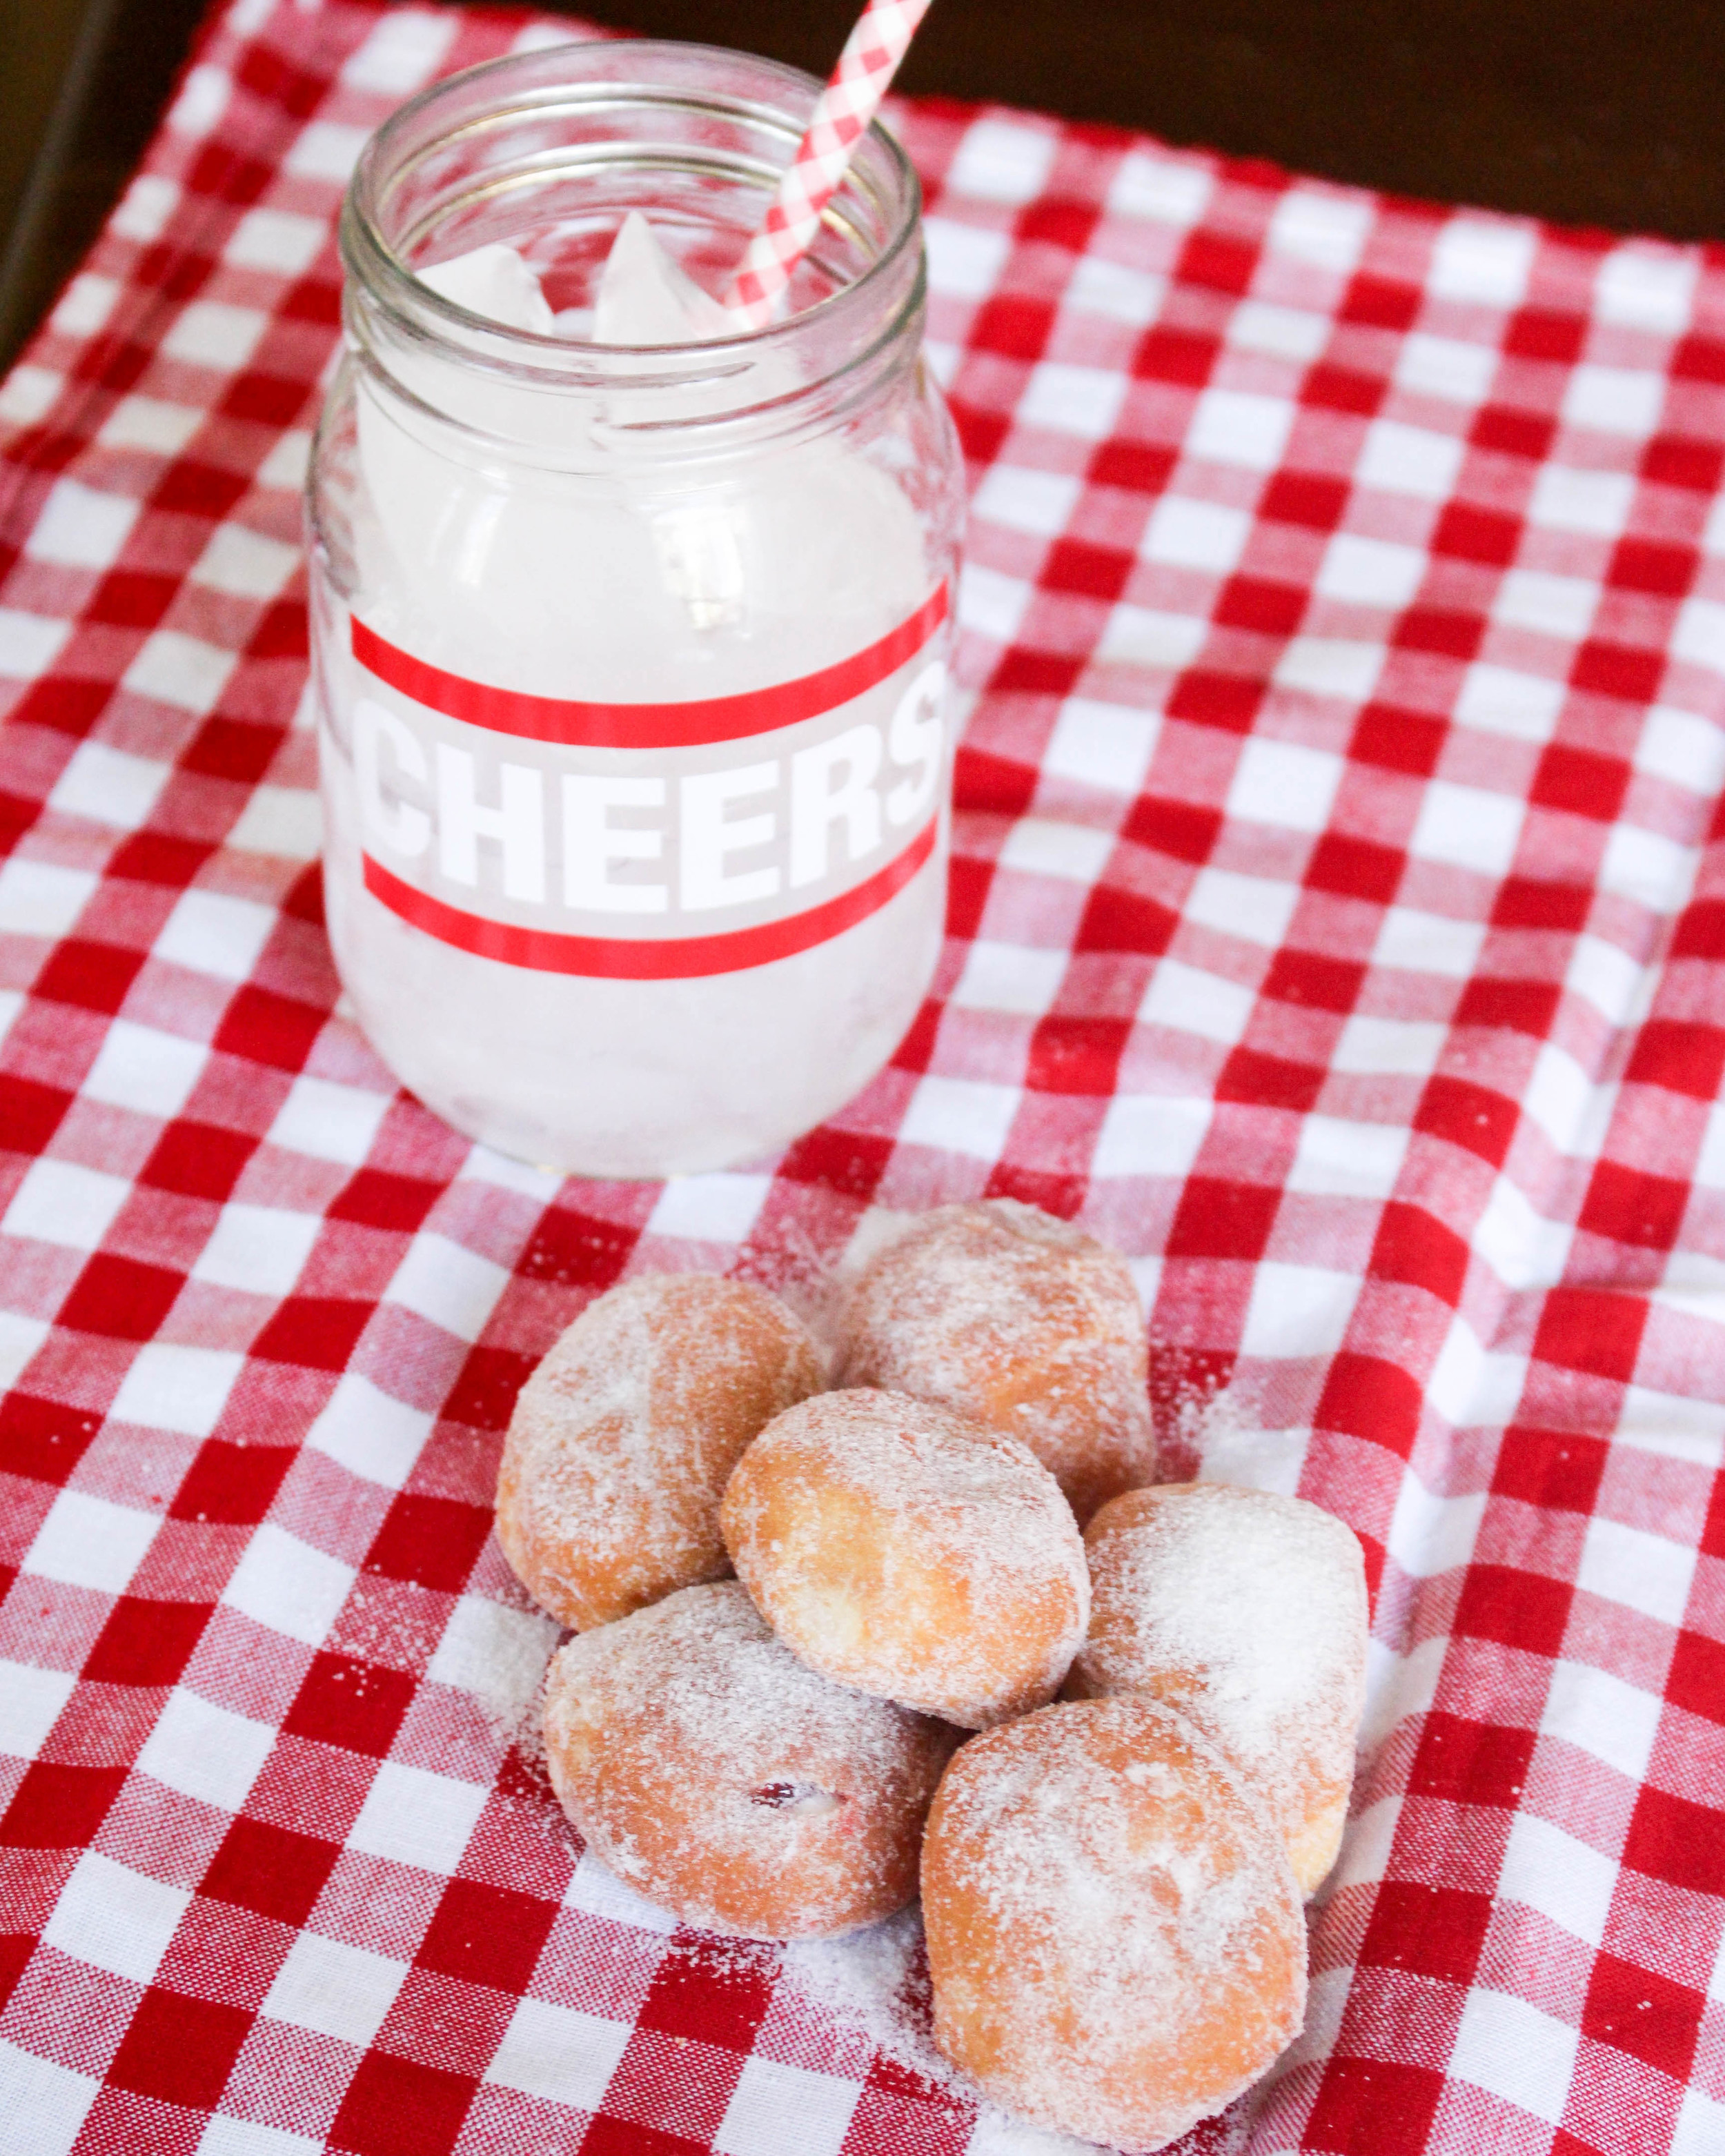 cheers_jelly_doughnuts_0316.jpg